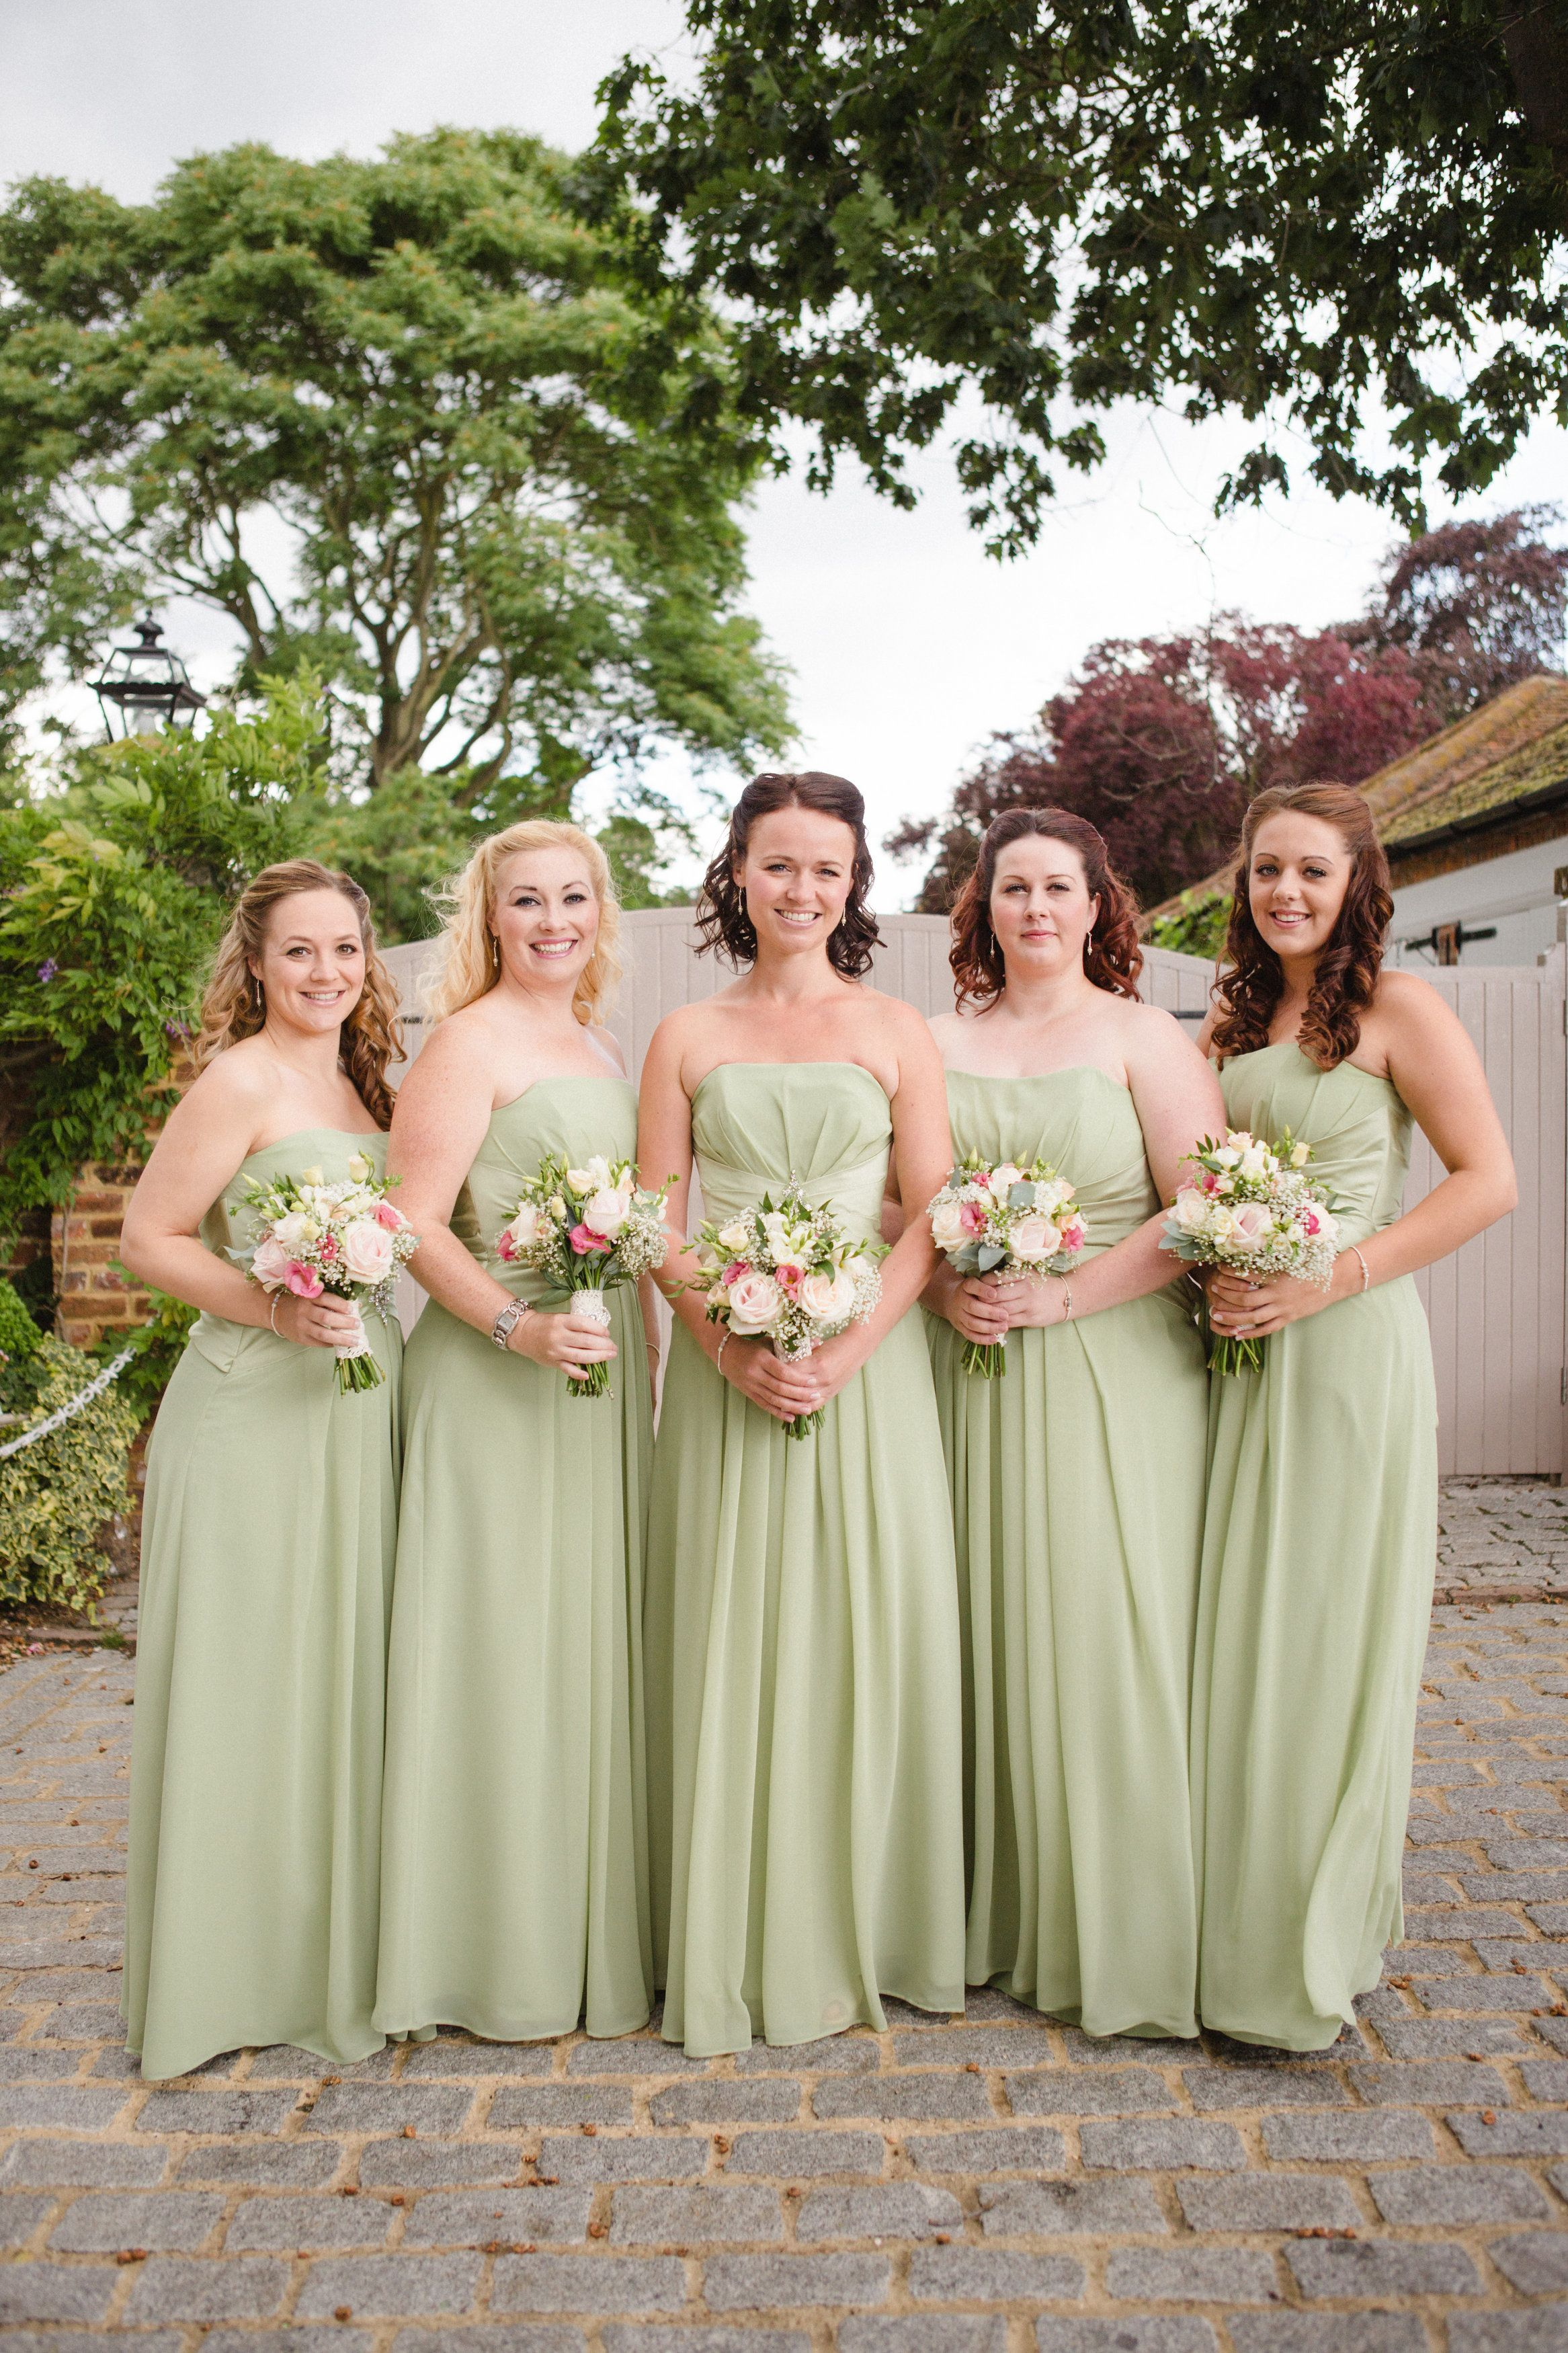 Green bridesmaids ebony rose monica bridesmaids pinterest green bridesmaids ebony rose monica ombrellifo Gallery